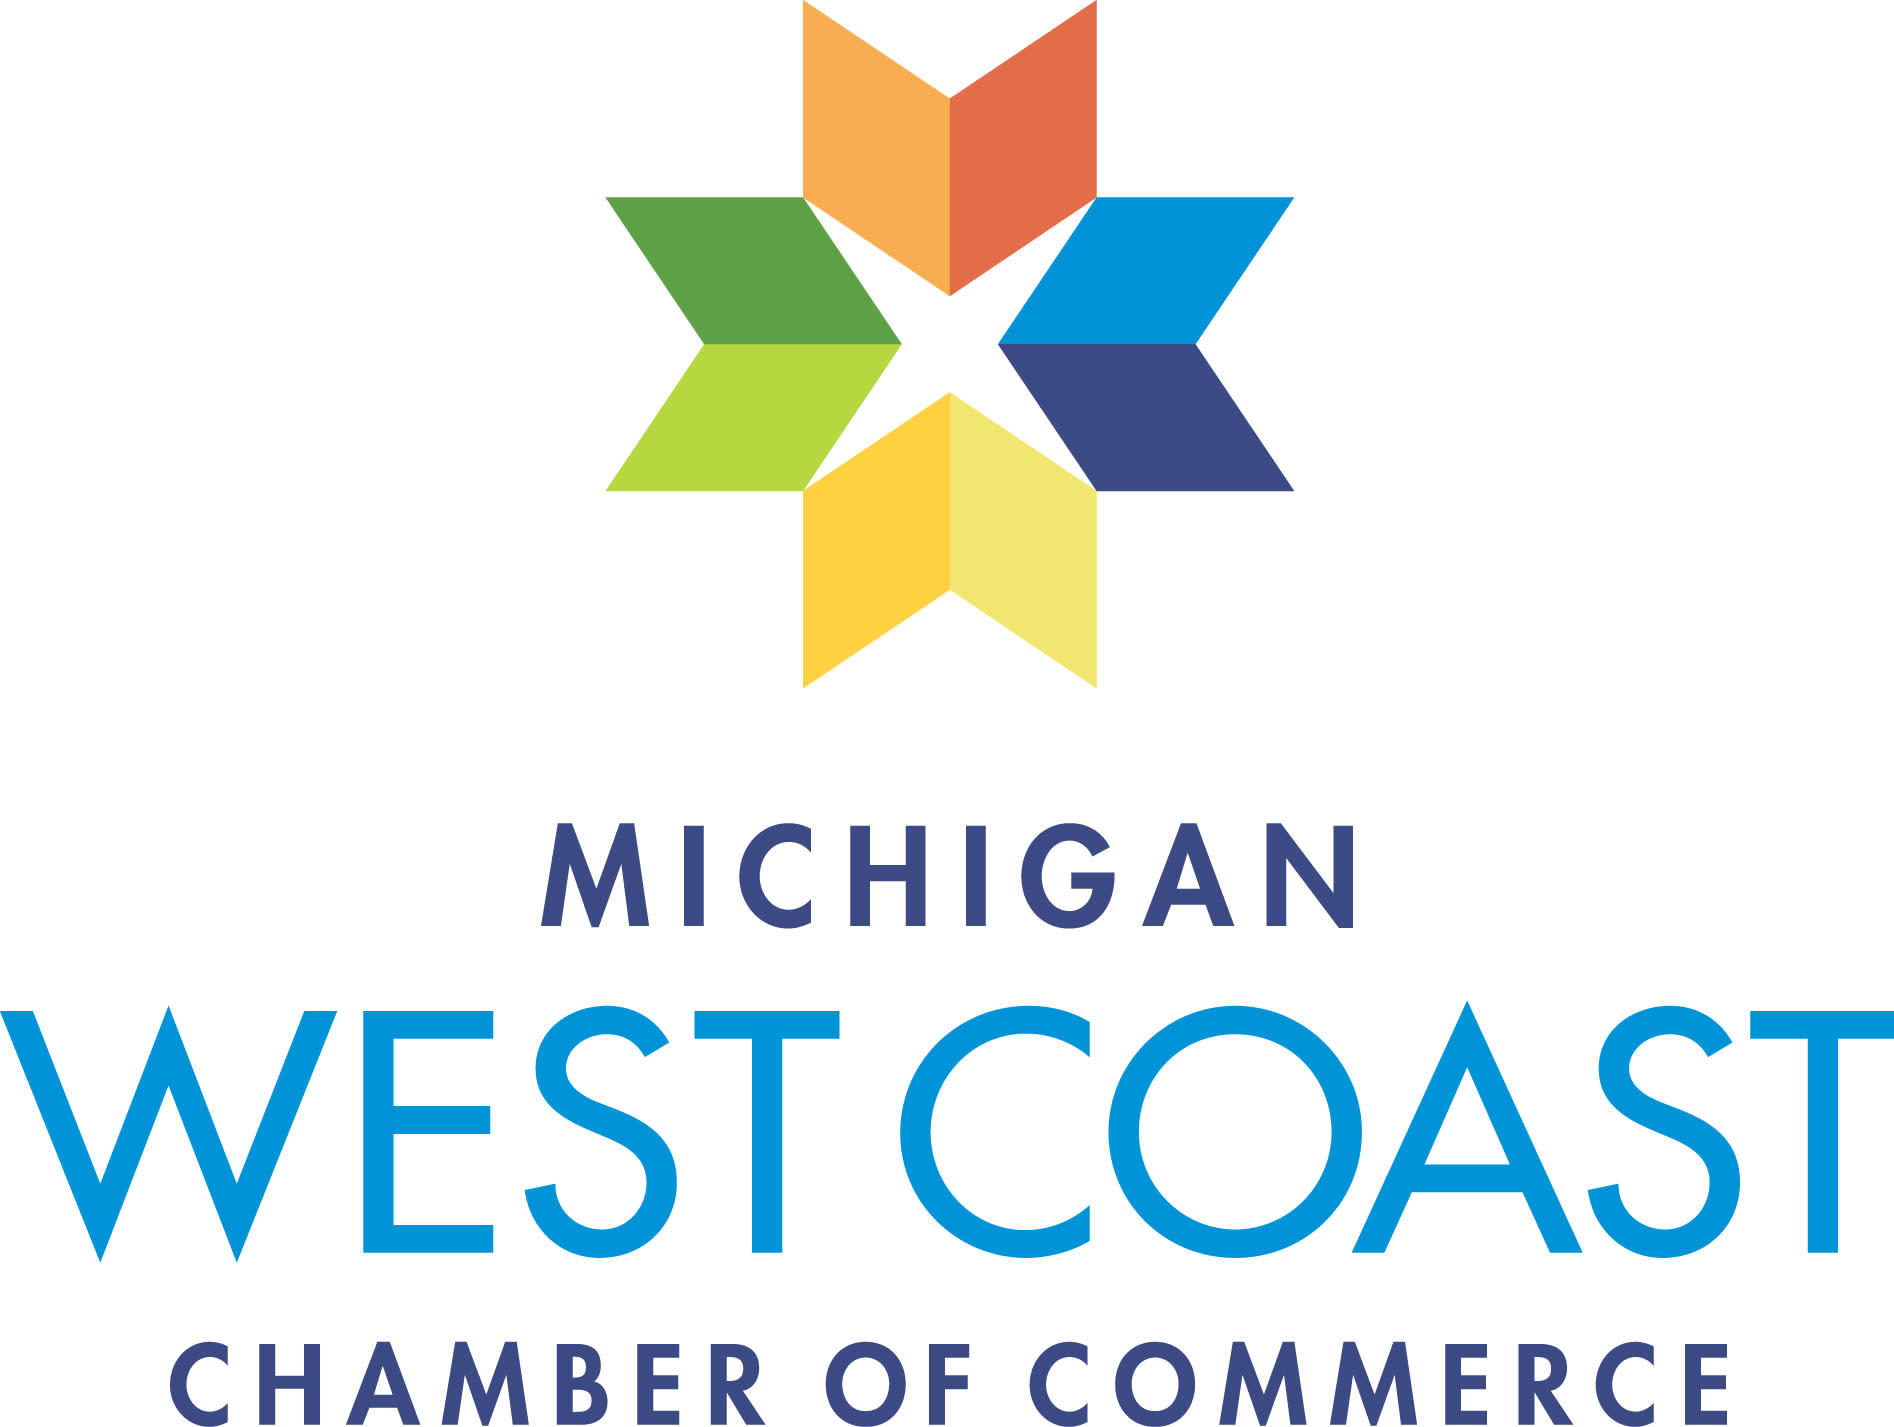 Michigan West Coast Chamber of Commerce